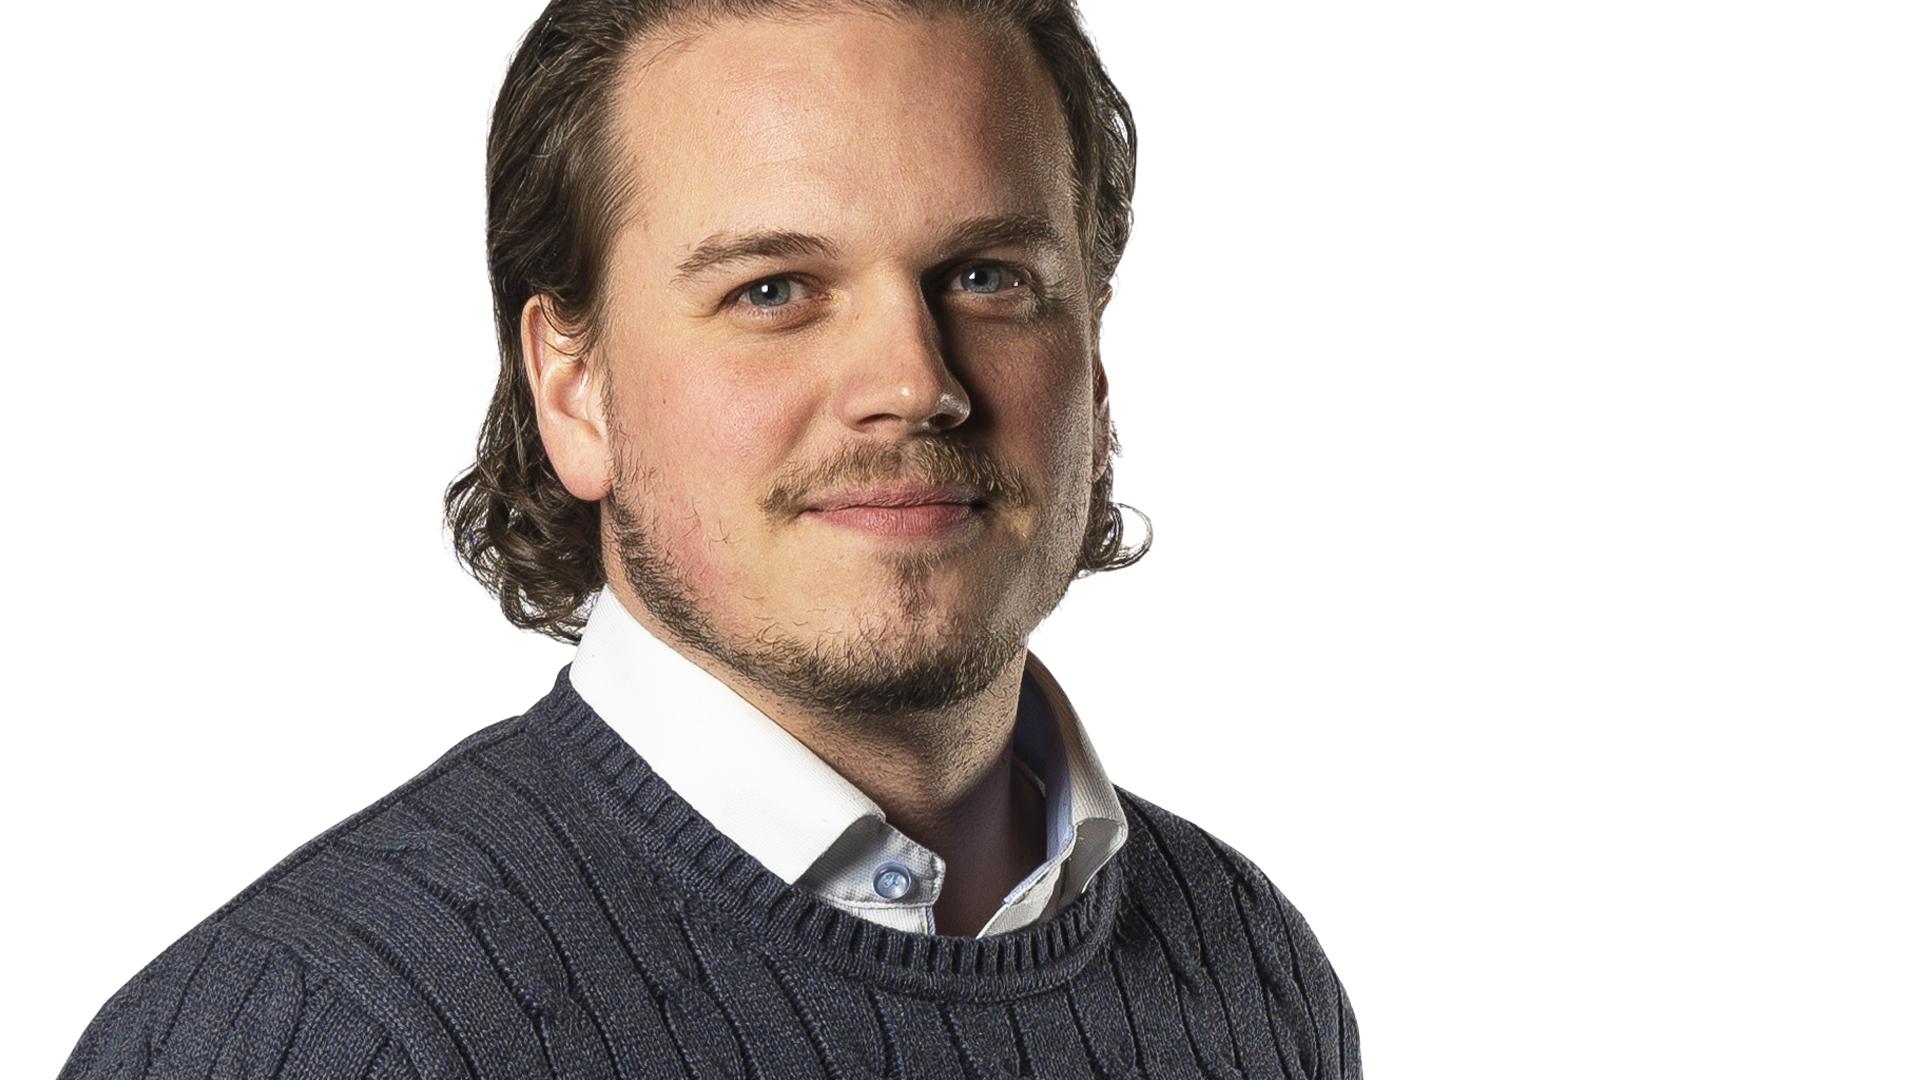 Jonathan Bergkvist